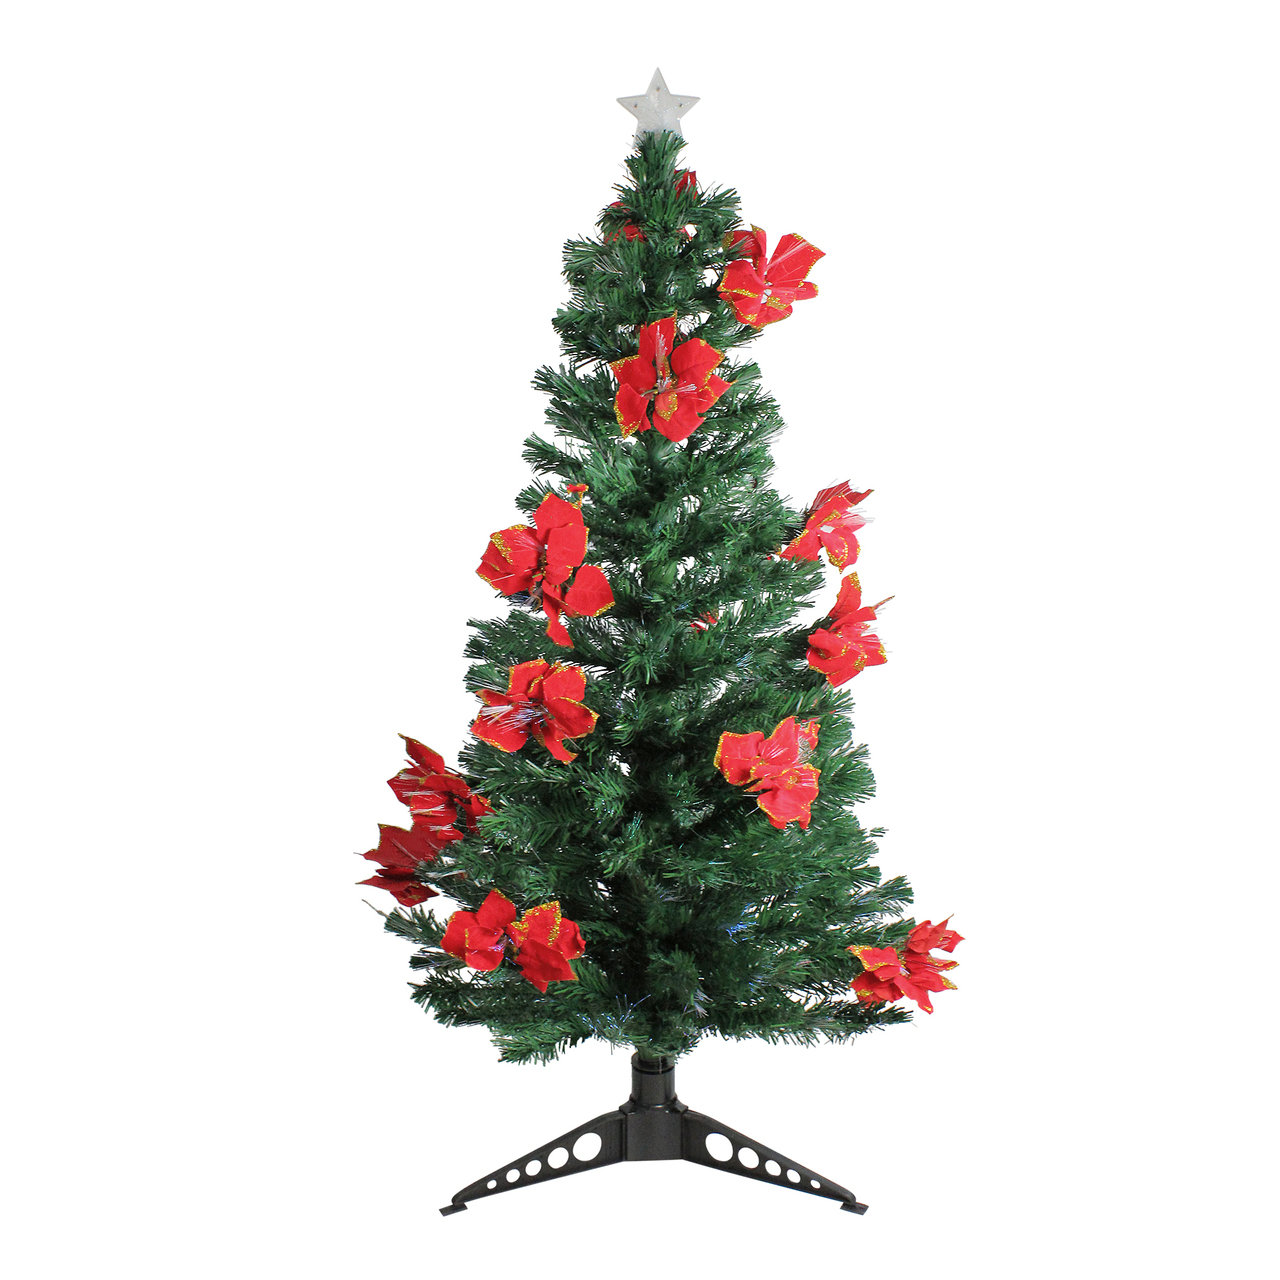 Pointsetta Christmas Tree.5 Pre Lit Fiber Optic Artificial Christmas Tree With Red Poinsettias Multi 30656121